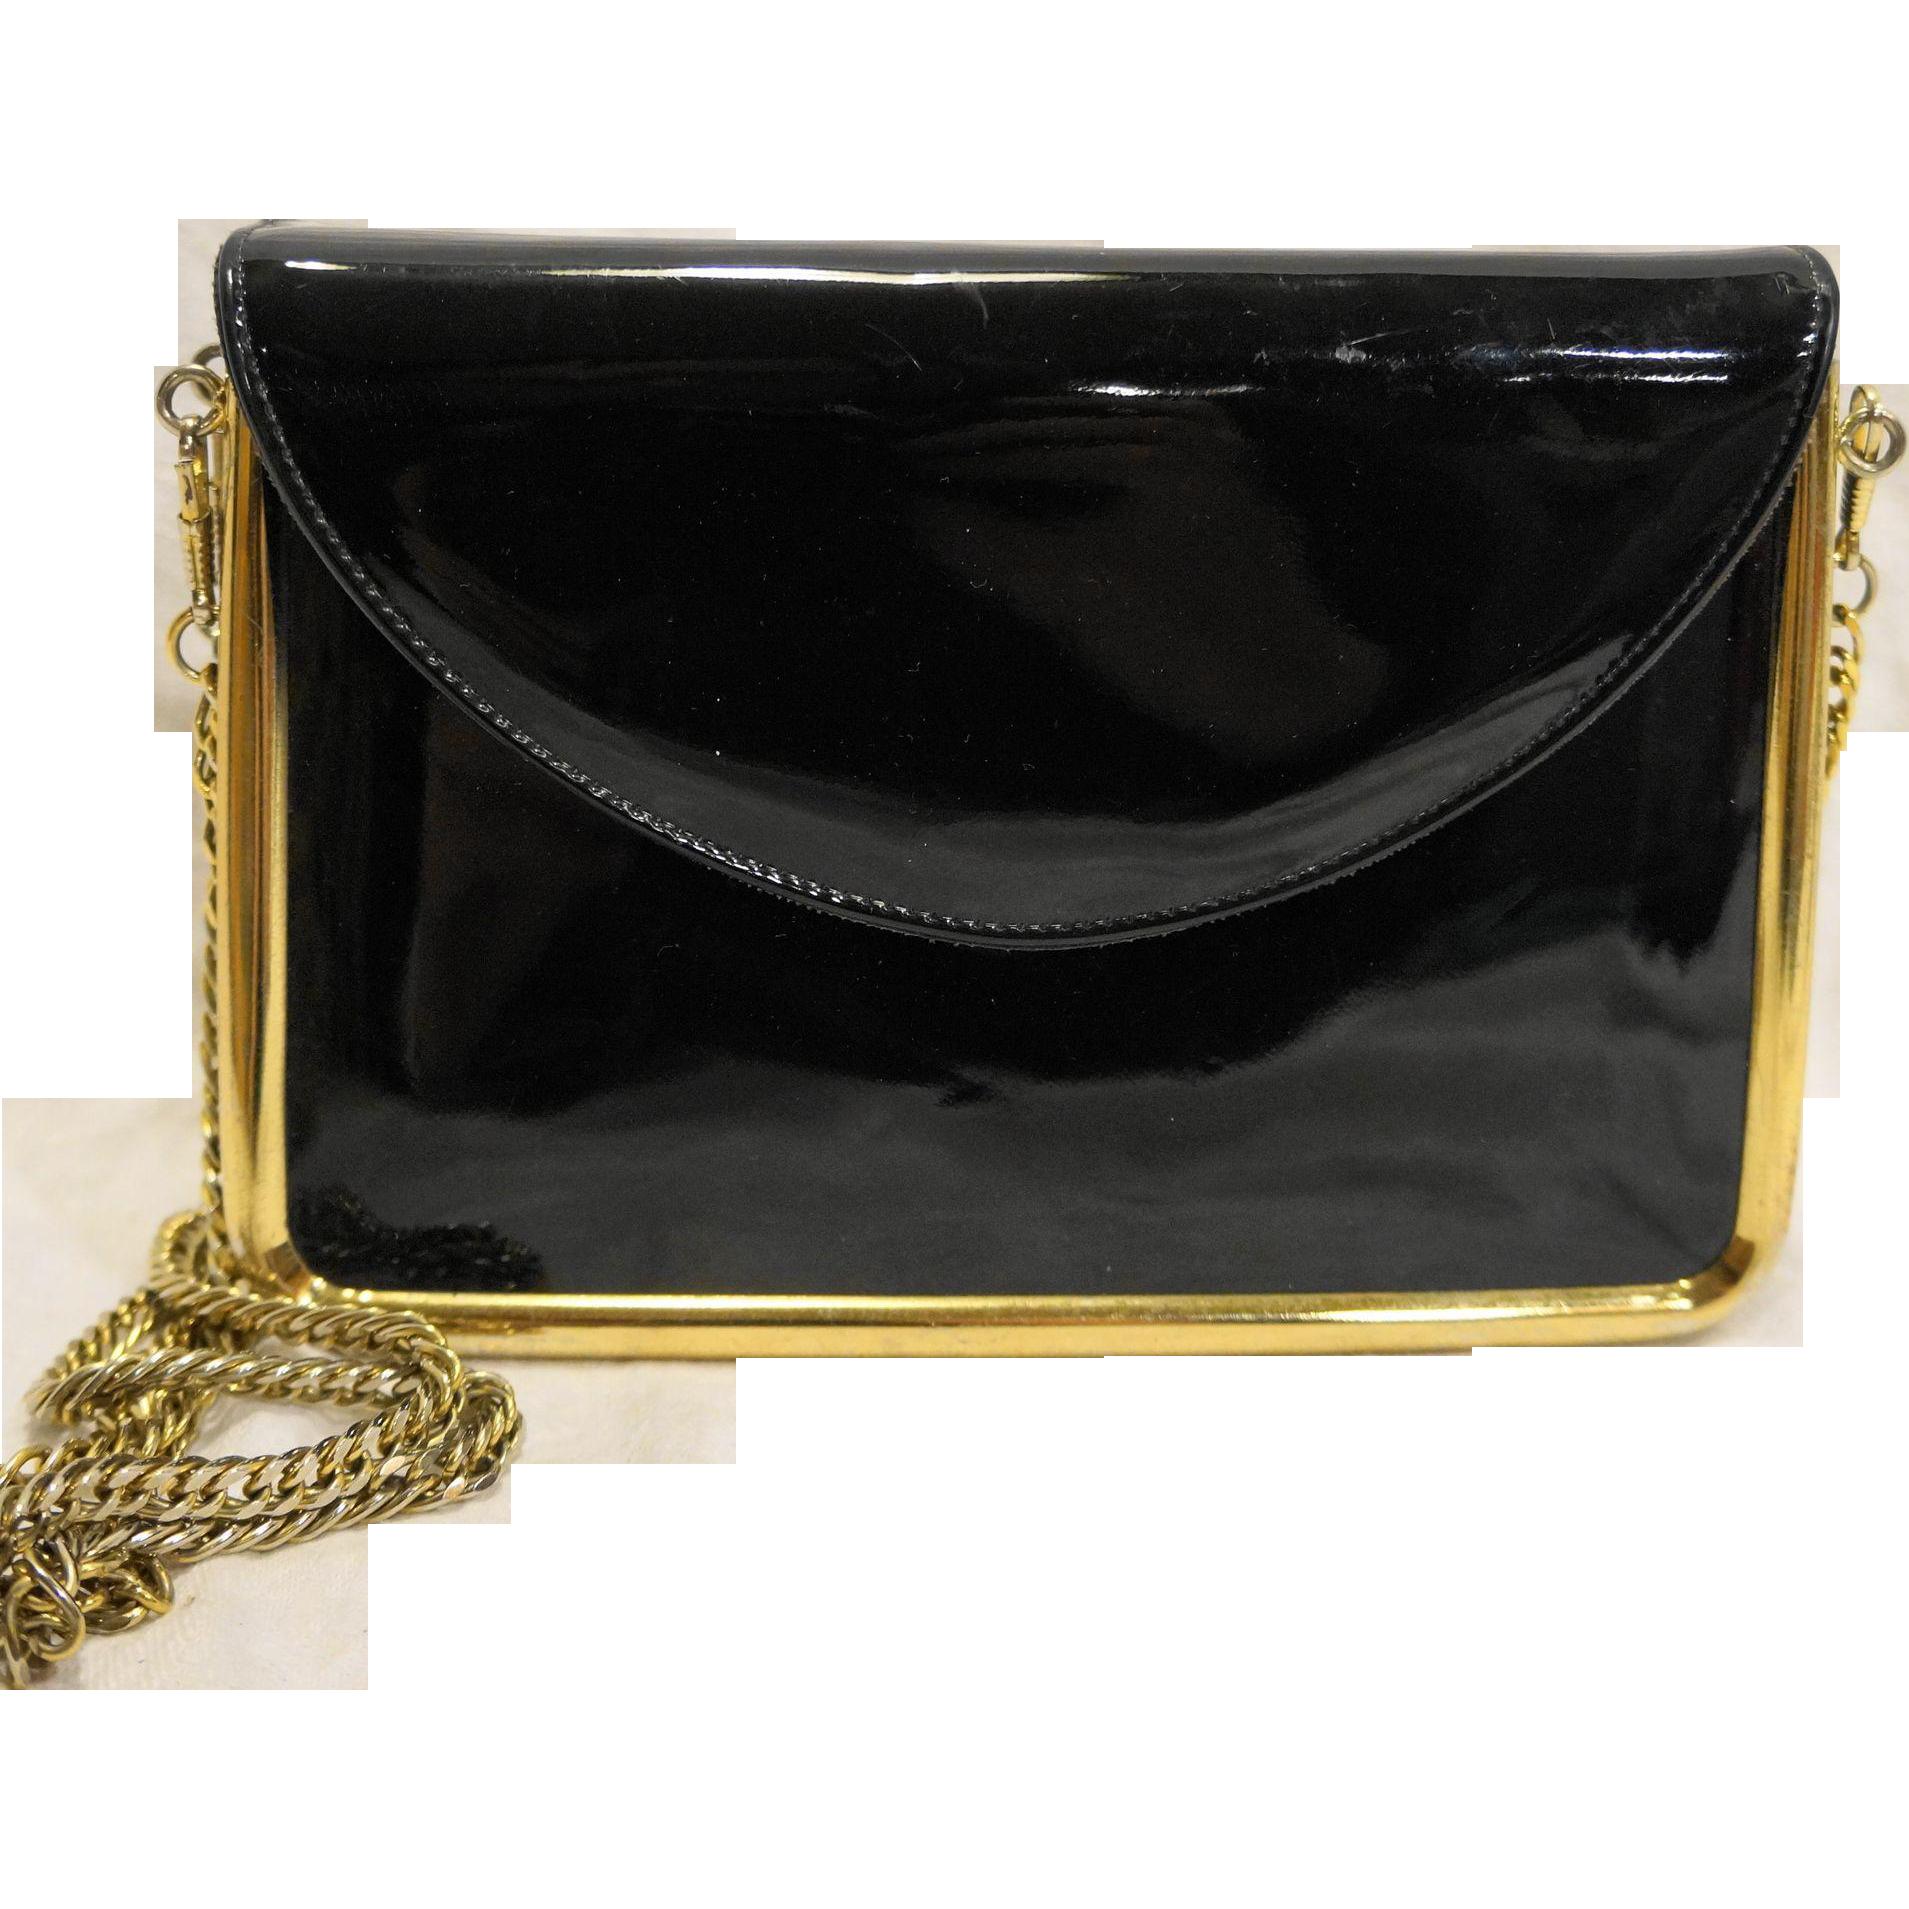 Cappagallo Black Patent Leather Evening Bag Clutch Purse